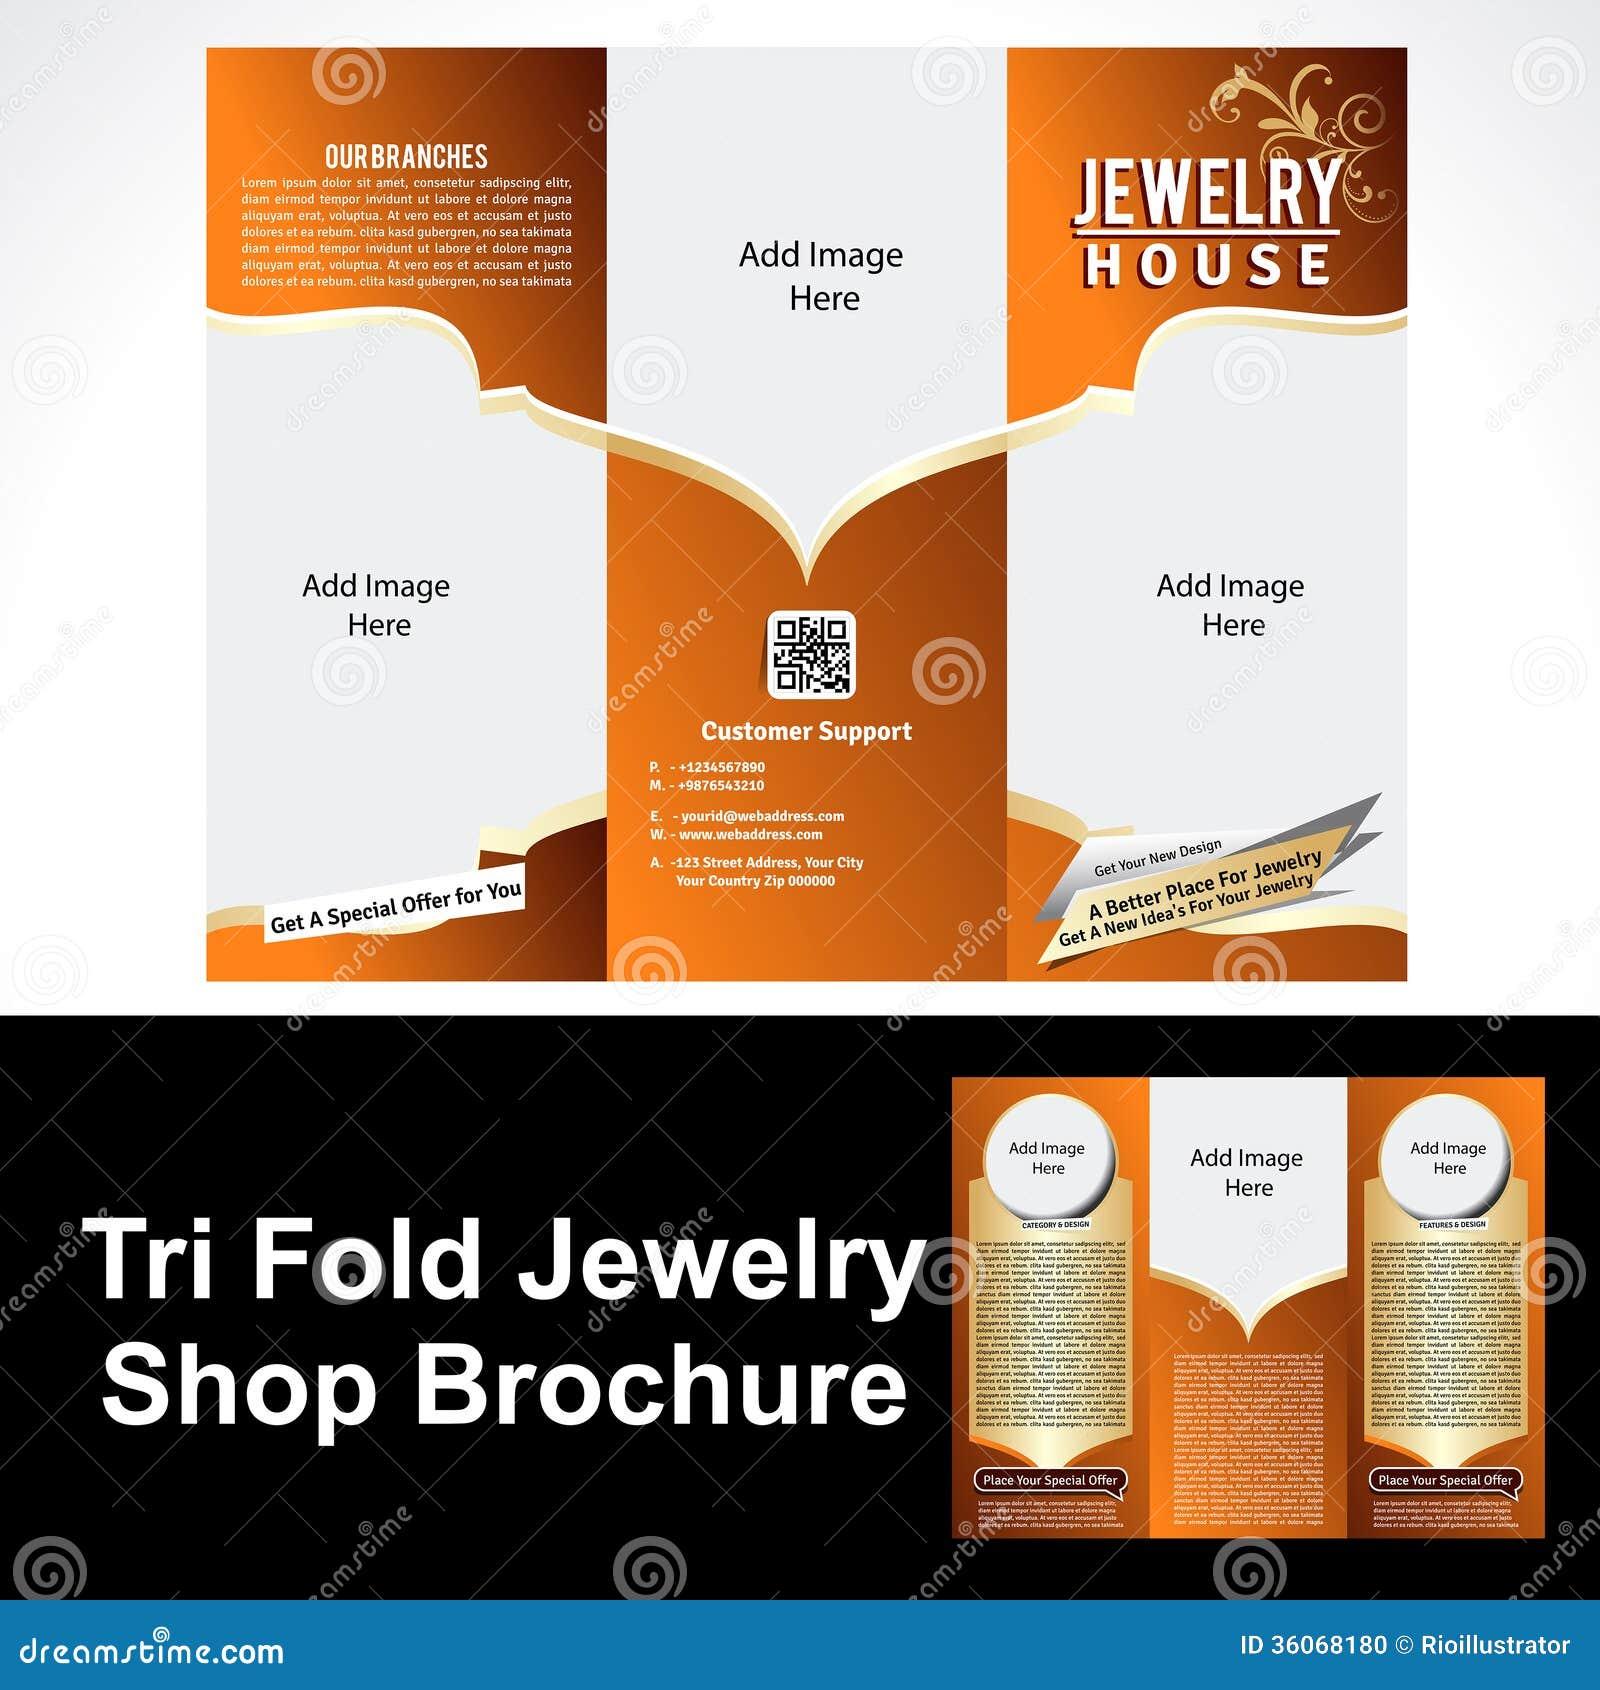 Tril Fold Jewelry Shop Brochure Stock Photo Image 36068180